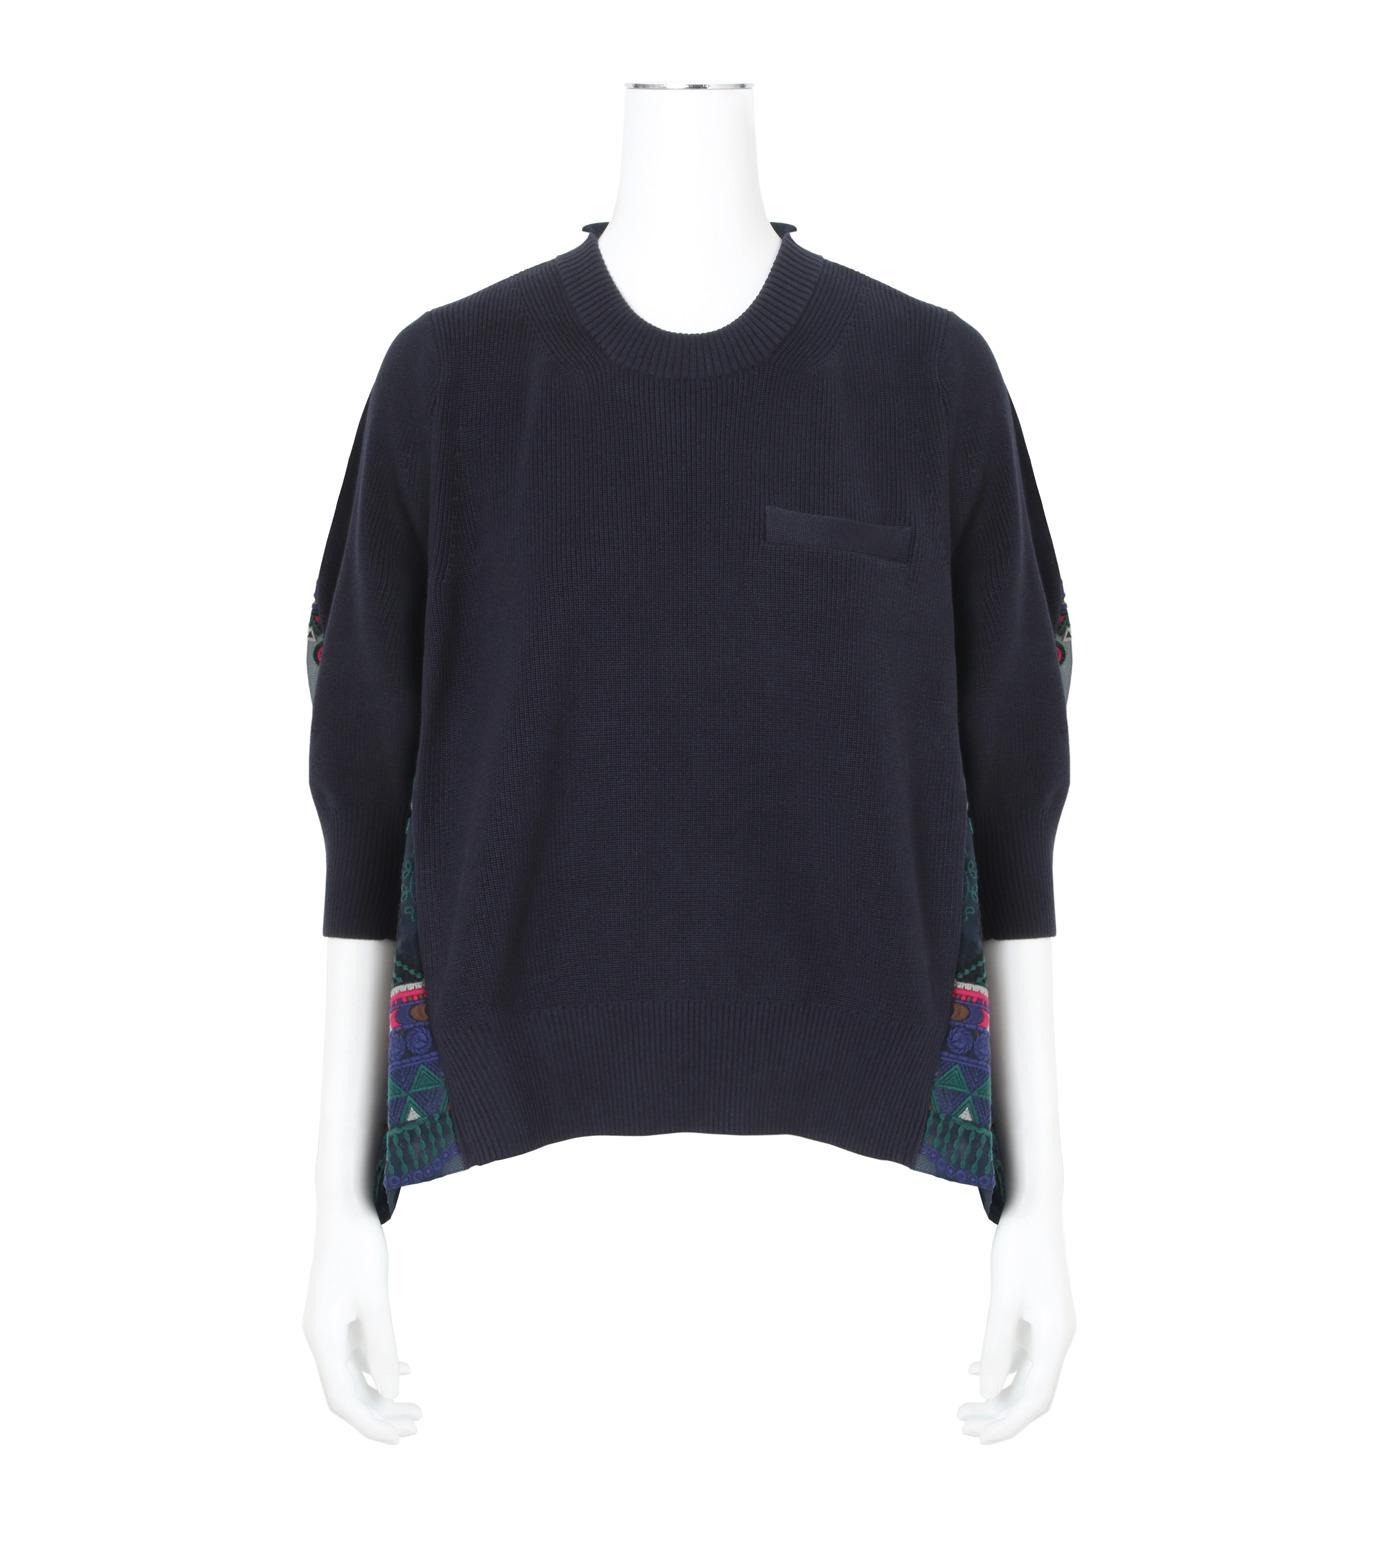 Sacai(サカイ)のTribal Lace Knit Pullover-NAVY(ニット/knit)-17-02945-93 拡大詳細画像1